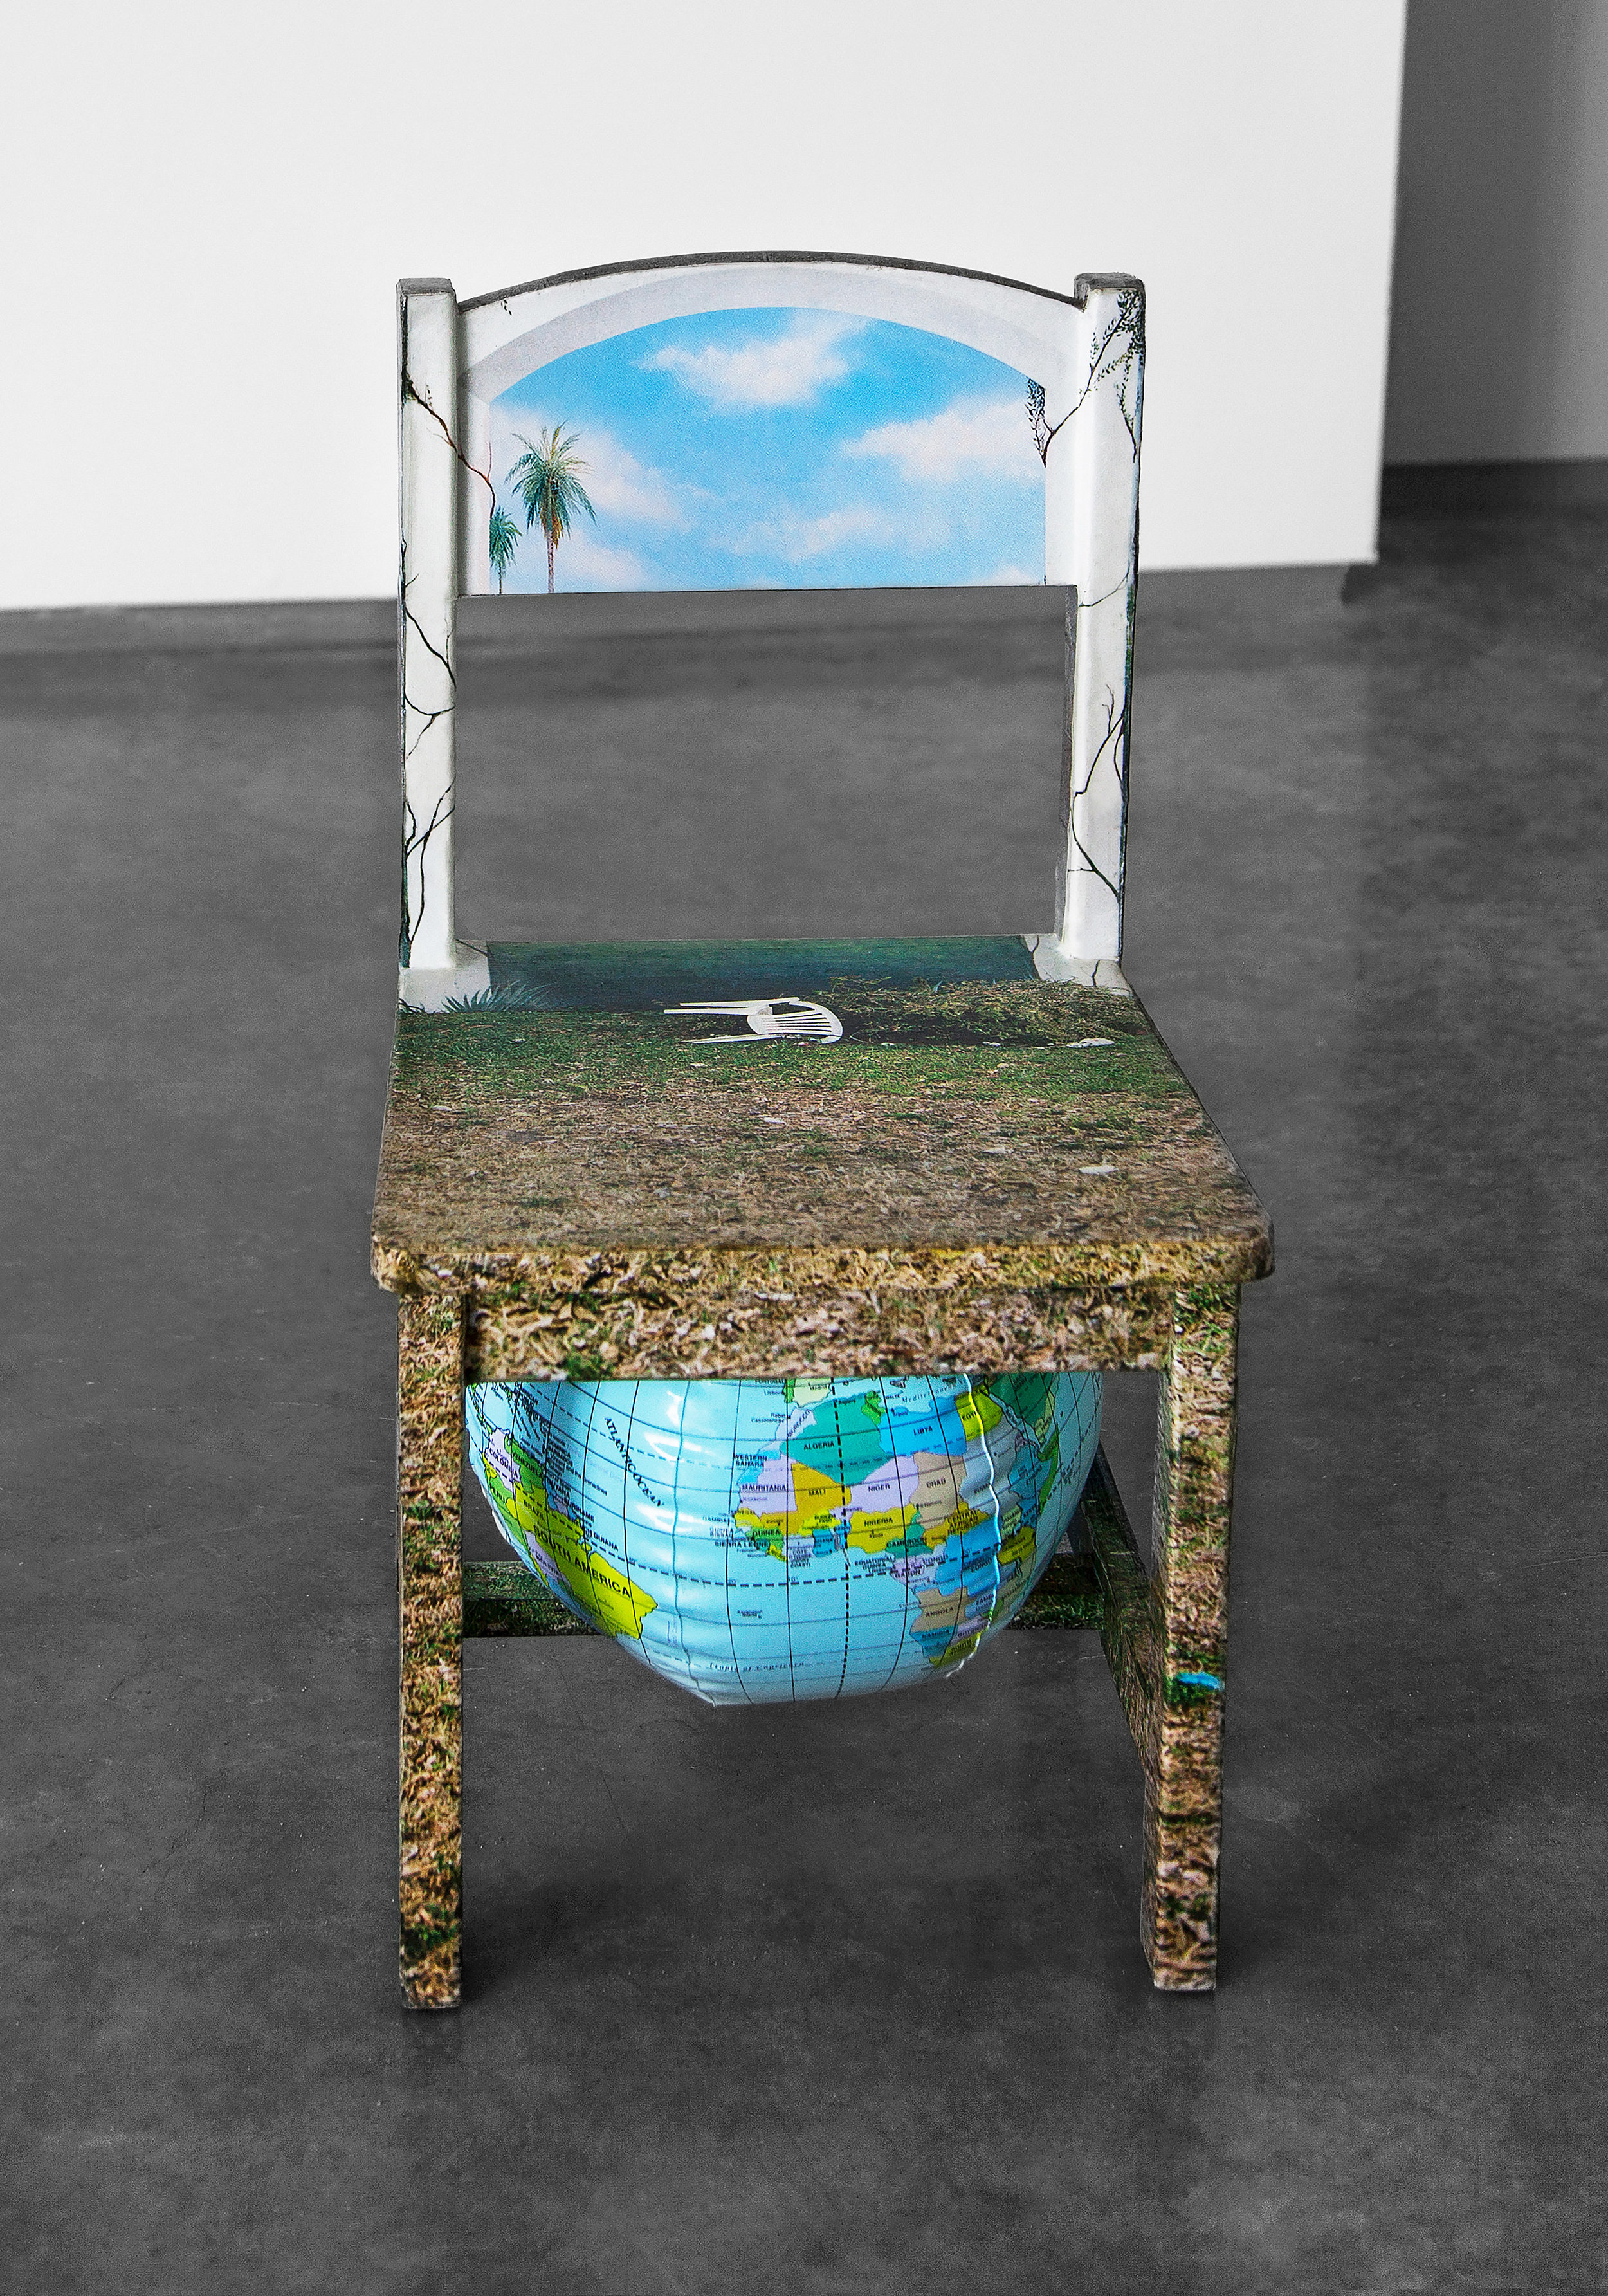 "Chair Mural II , 2014, archival inkjet print, glue, wood chair, inflatable globe, 11""x 11.5""x 21"" (28 cm x 29.2 cm x 53.3 cm)"